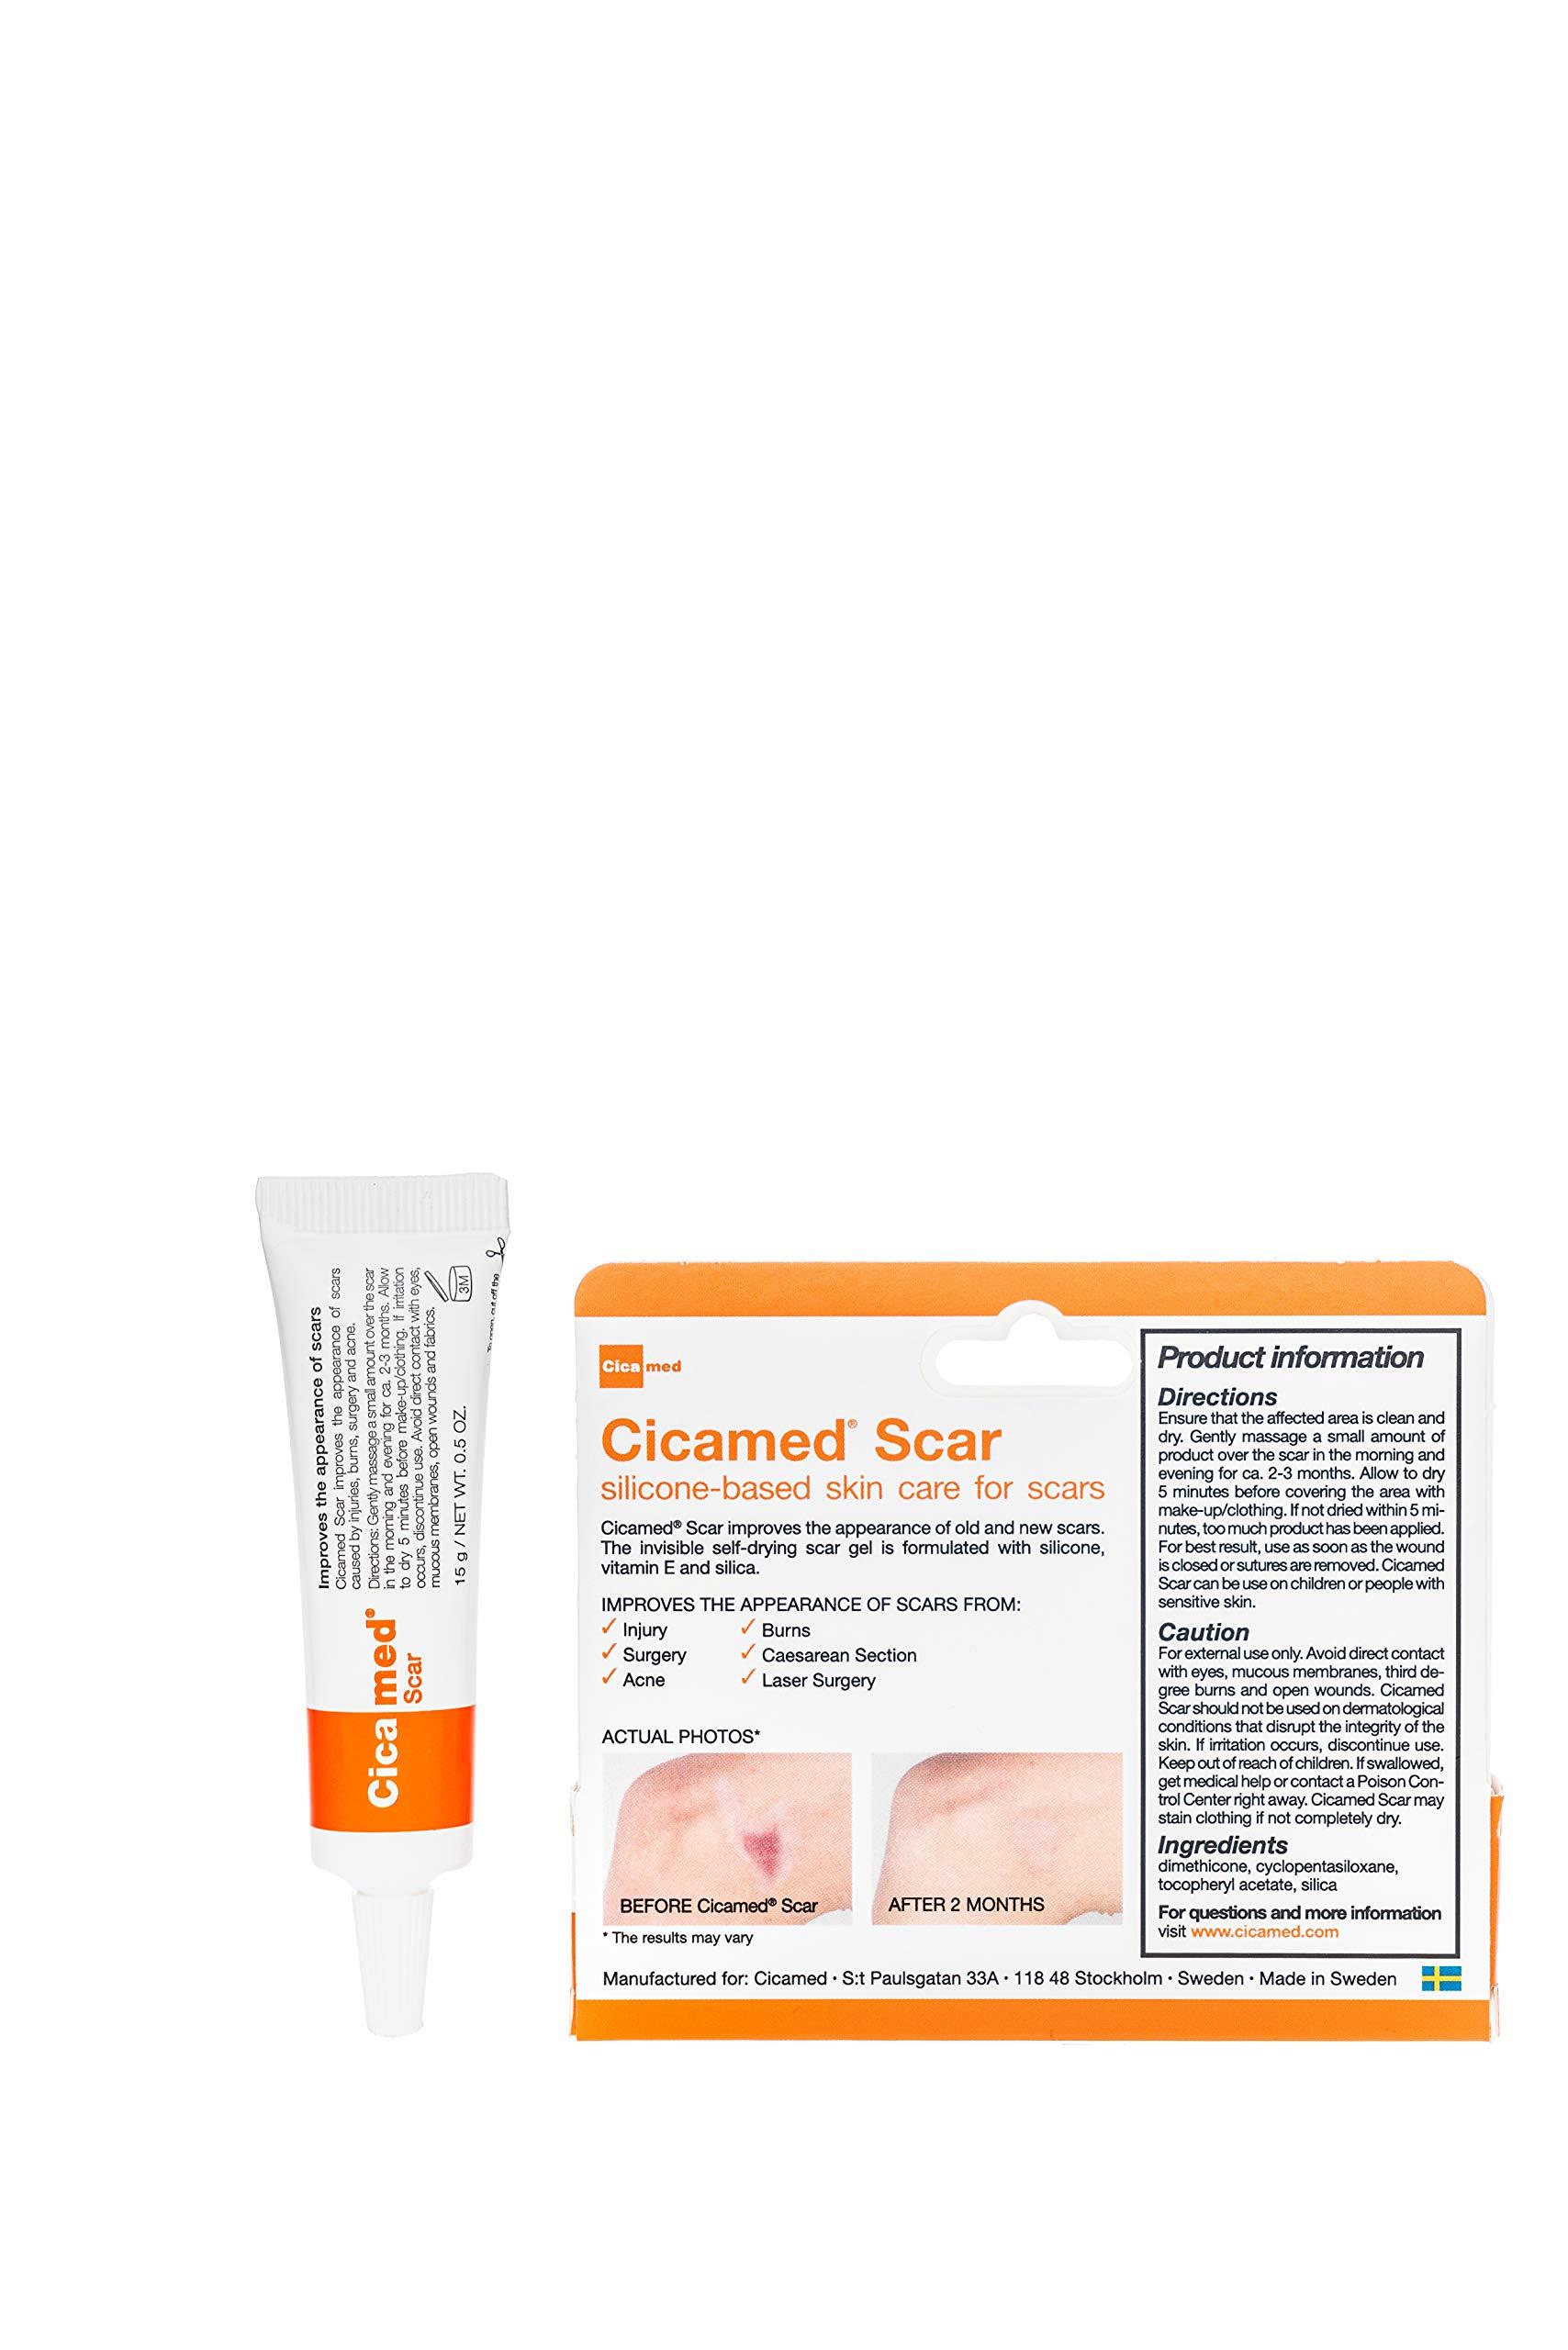 Cicablock Scar Sun Protection Uva Uvb Sunscreen Cicamed Organic